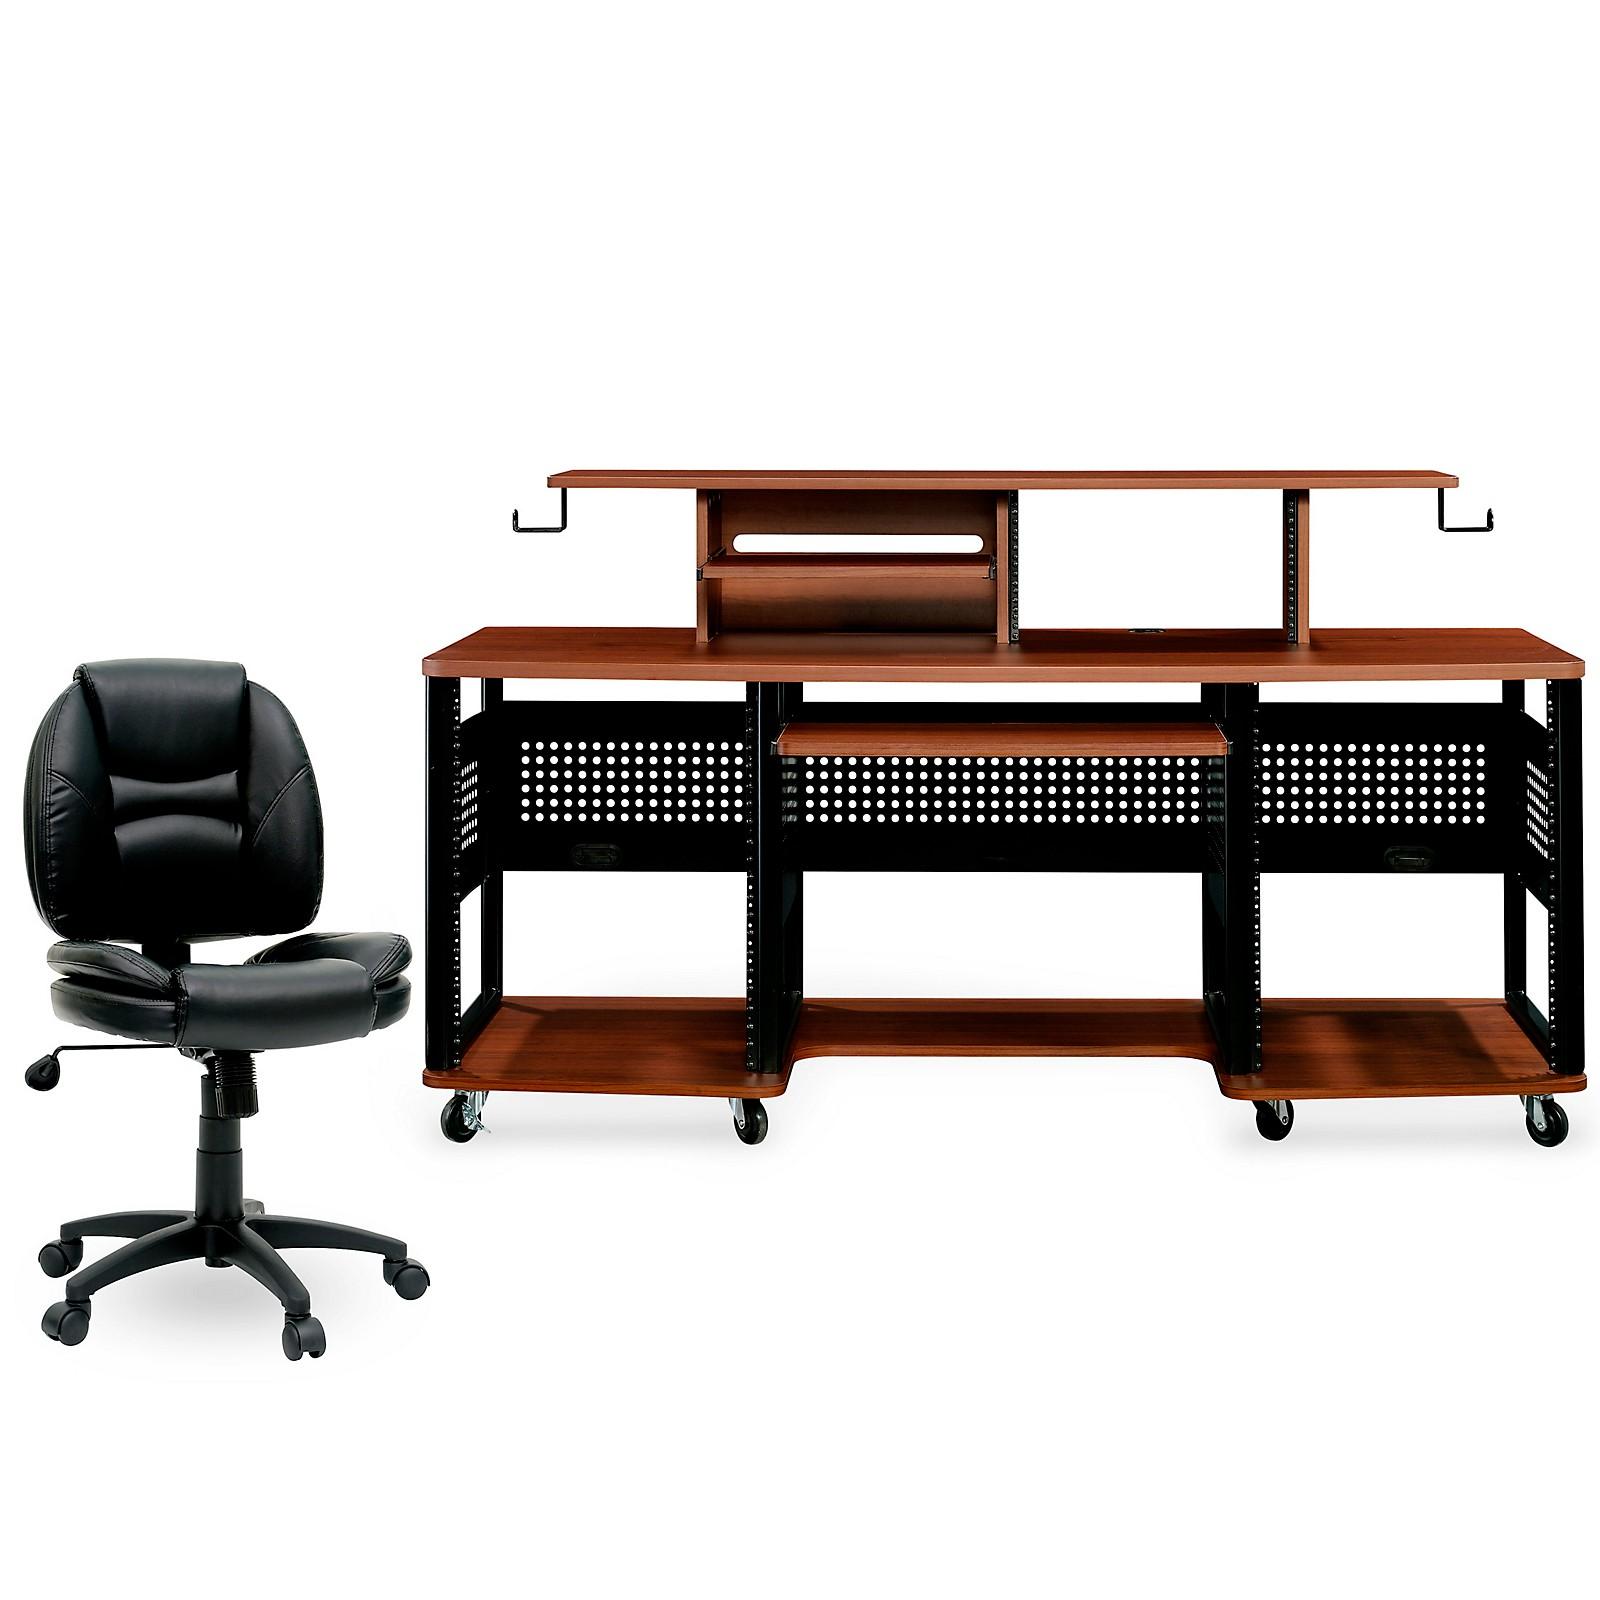 Studio RTA Producer Station Cherry and Task Chair DuraPlush Bundle